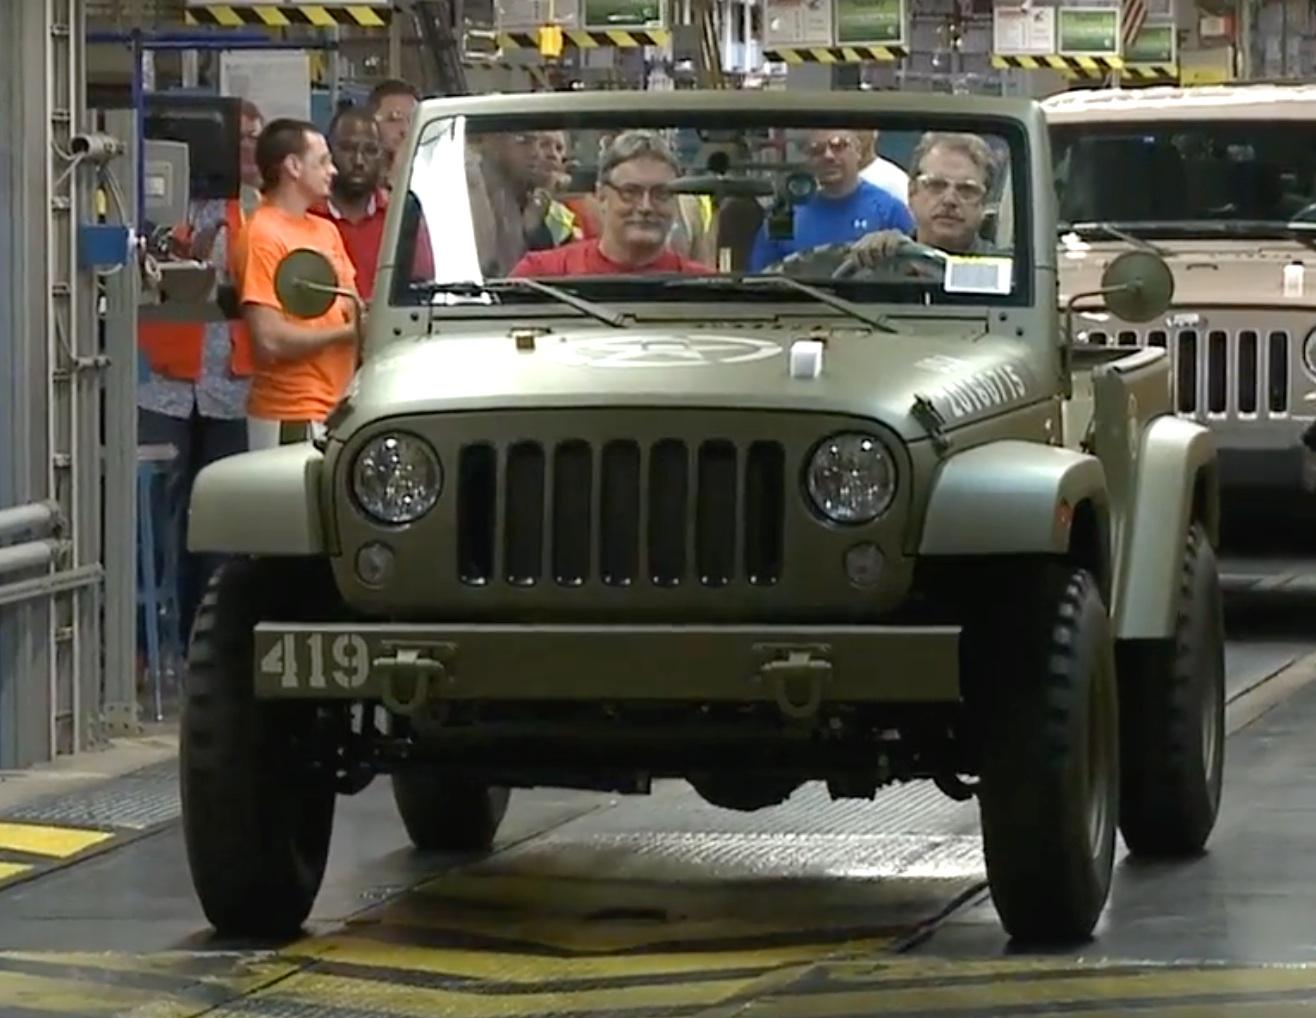 Imagenes De Jeep Wrangler >> Imágenes de autos hermosos (9)   Lista de Carros